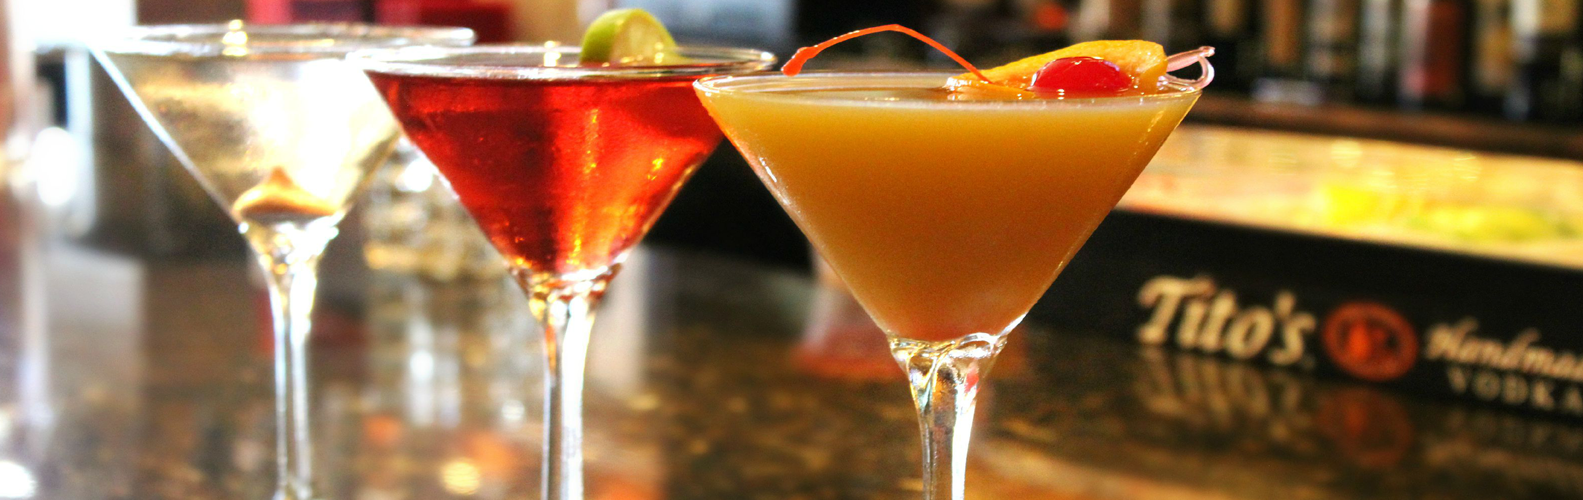 marinos-martini-slide